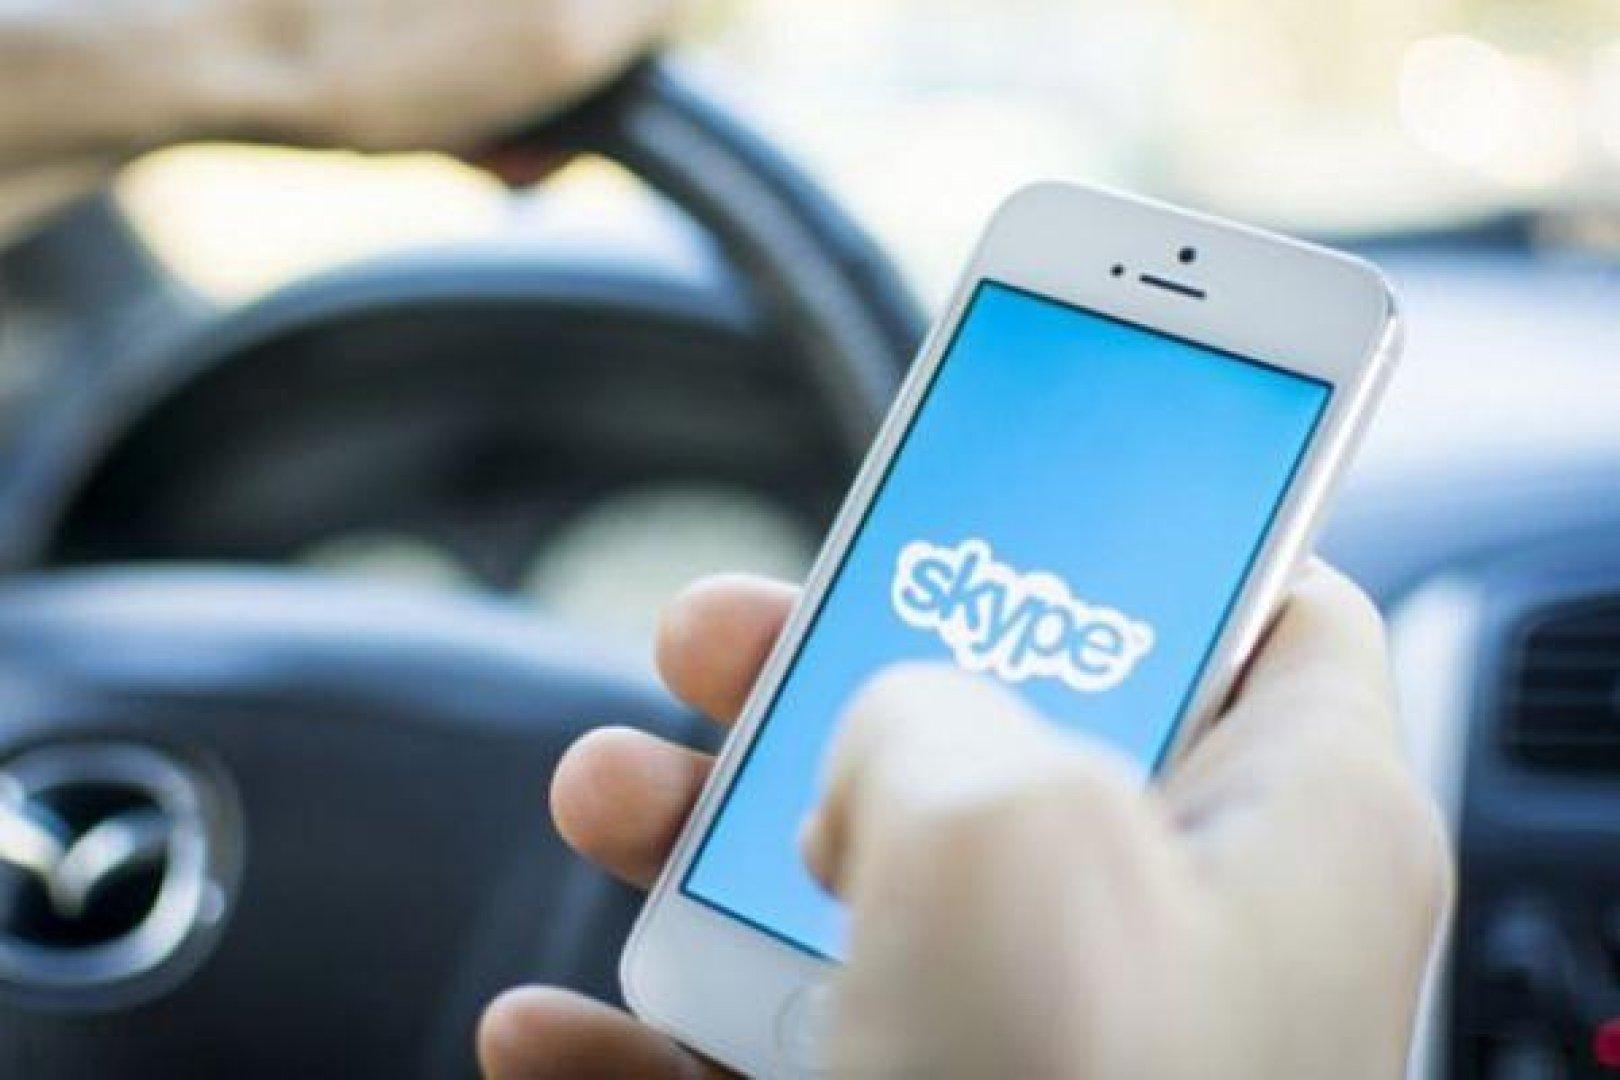 В КНР измагазина приложений Apple удалили Skype